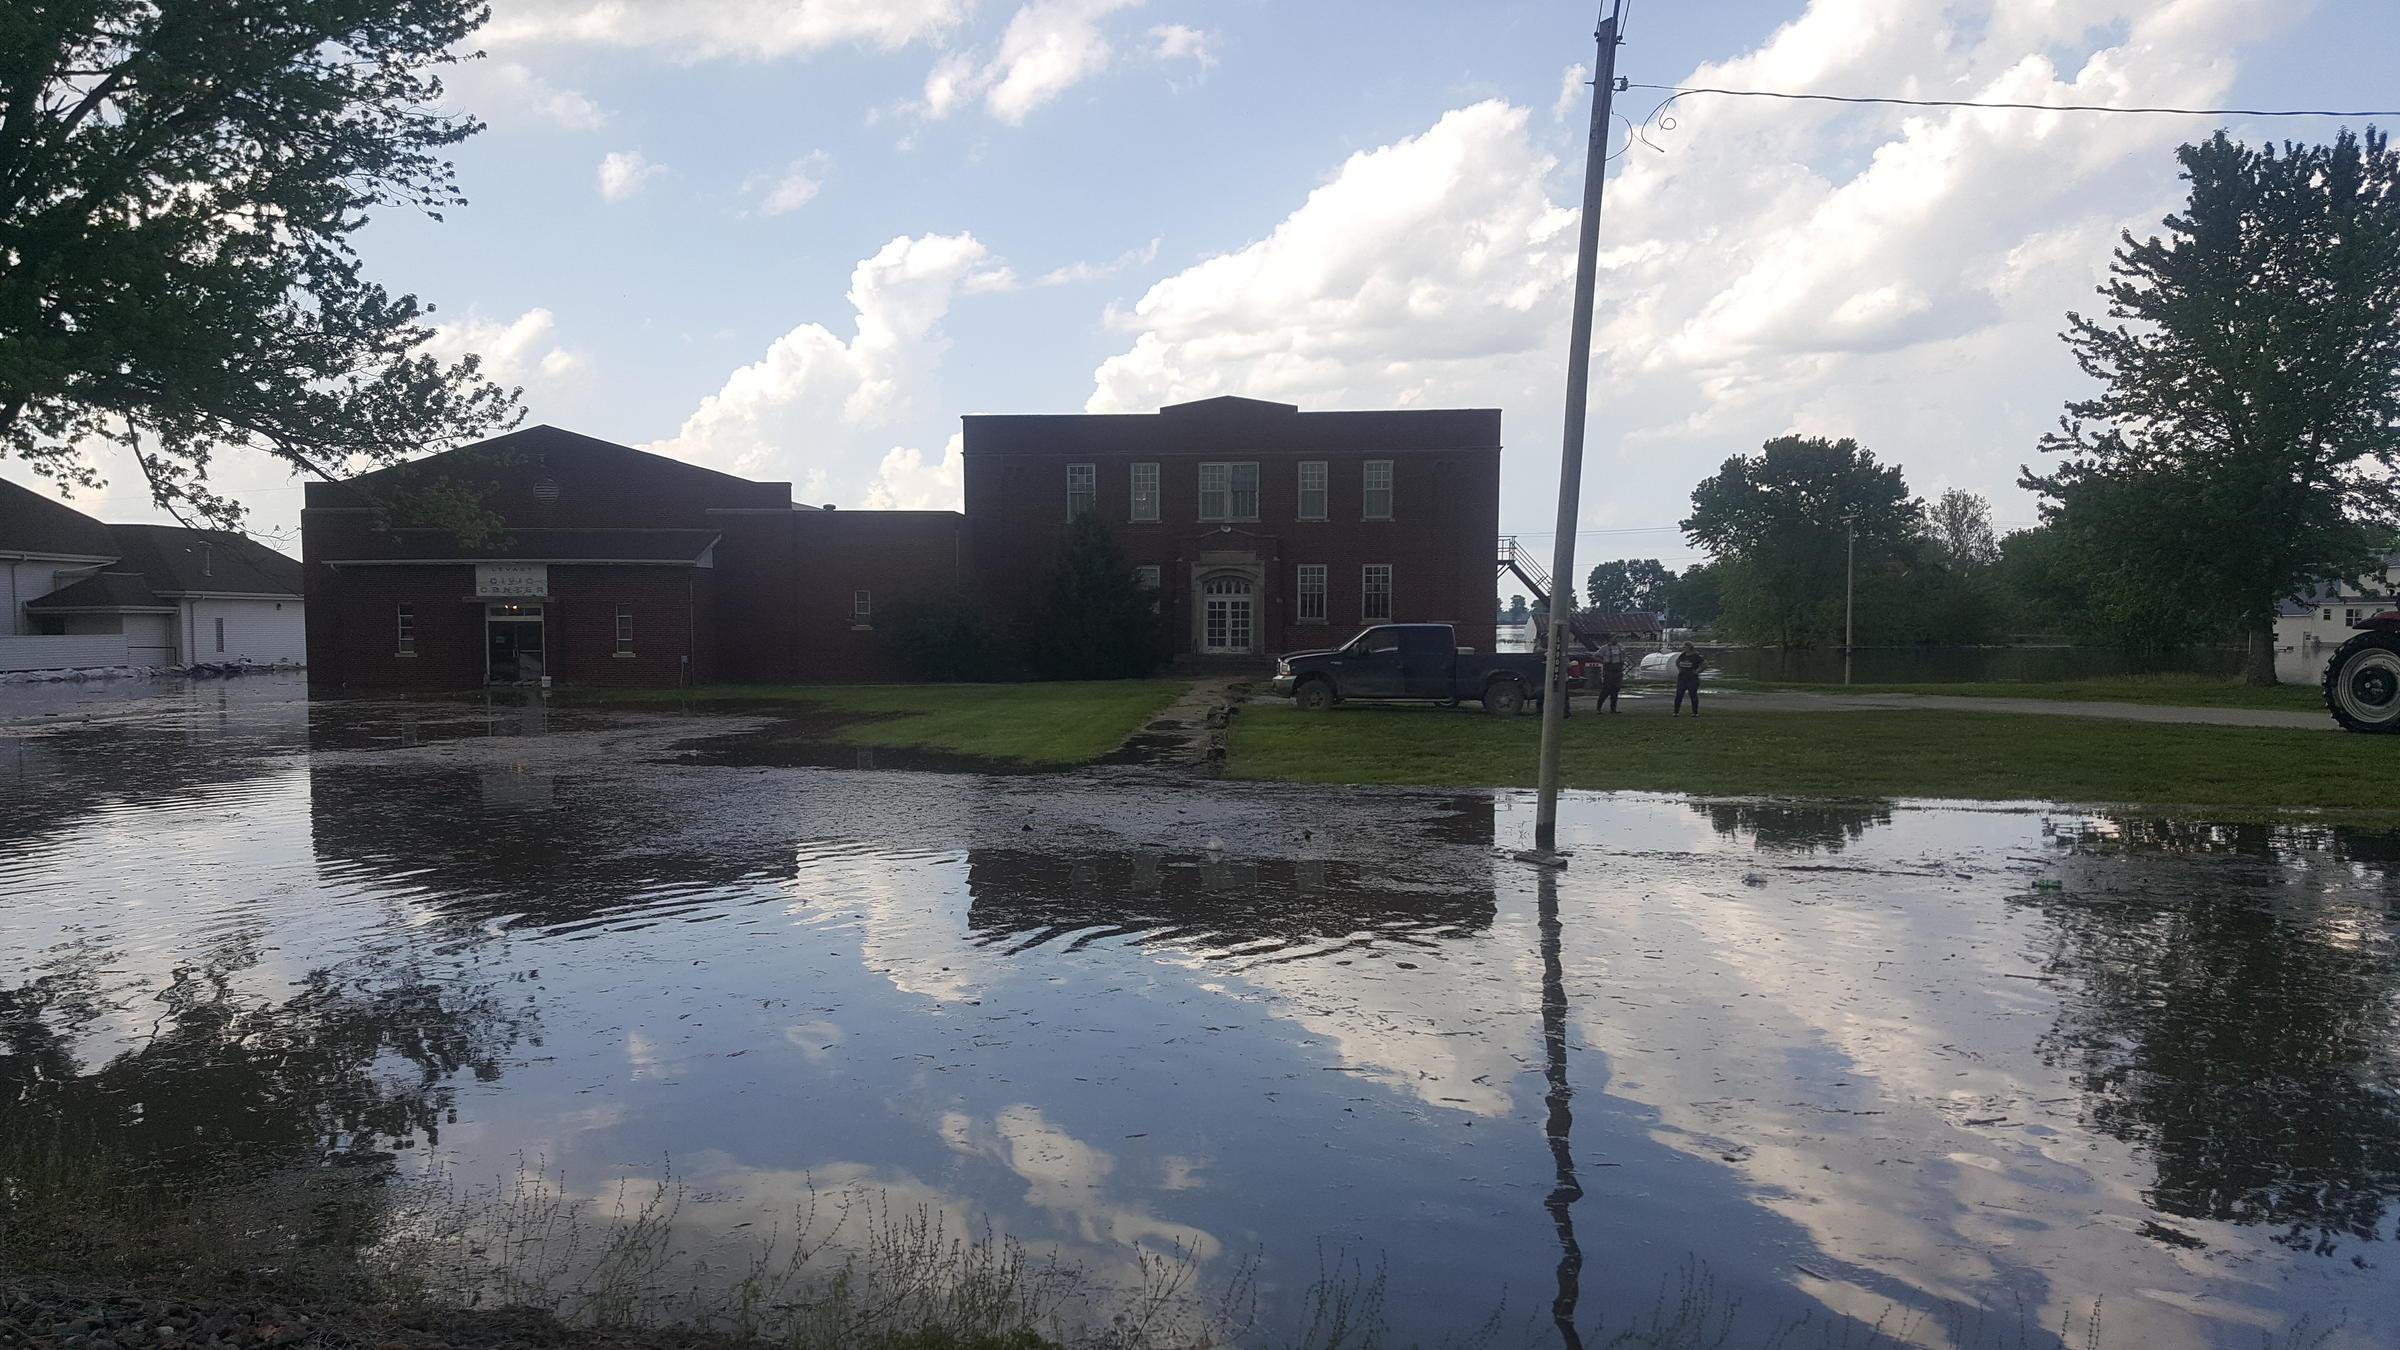 Levee Breach Prompts Evacuations, Water Rescues East Of Kansas City